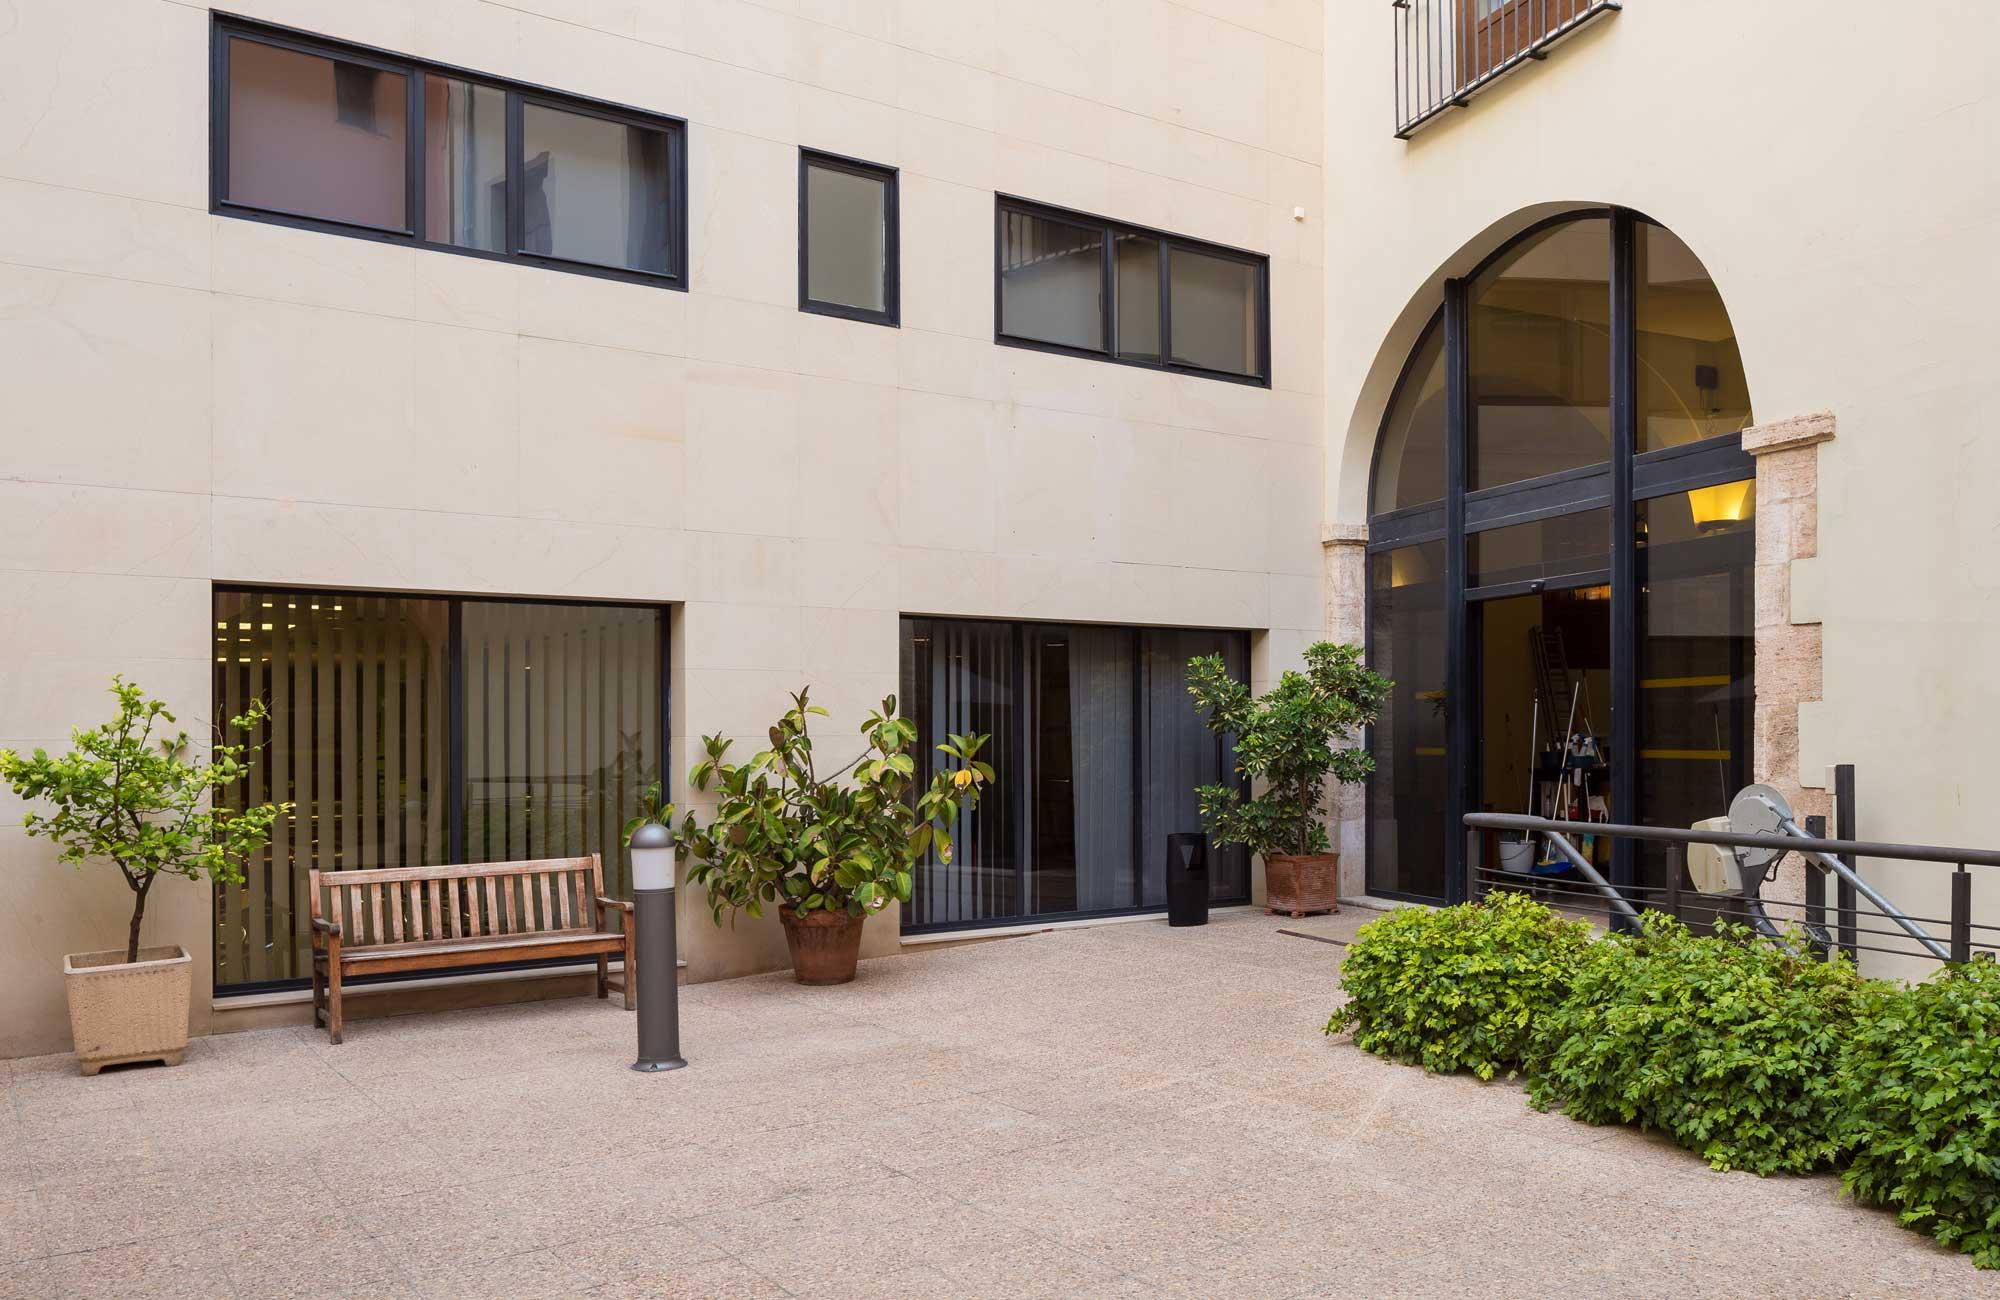 Residencia de Estudiantes Rector Pesset - Proyectos RZS